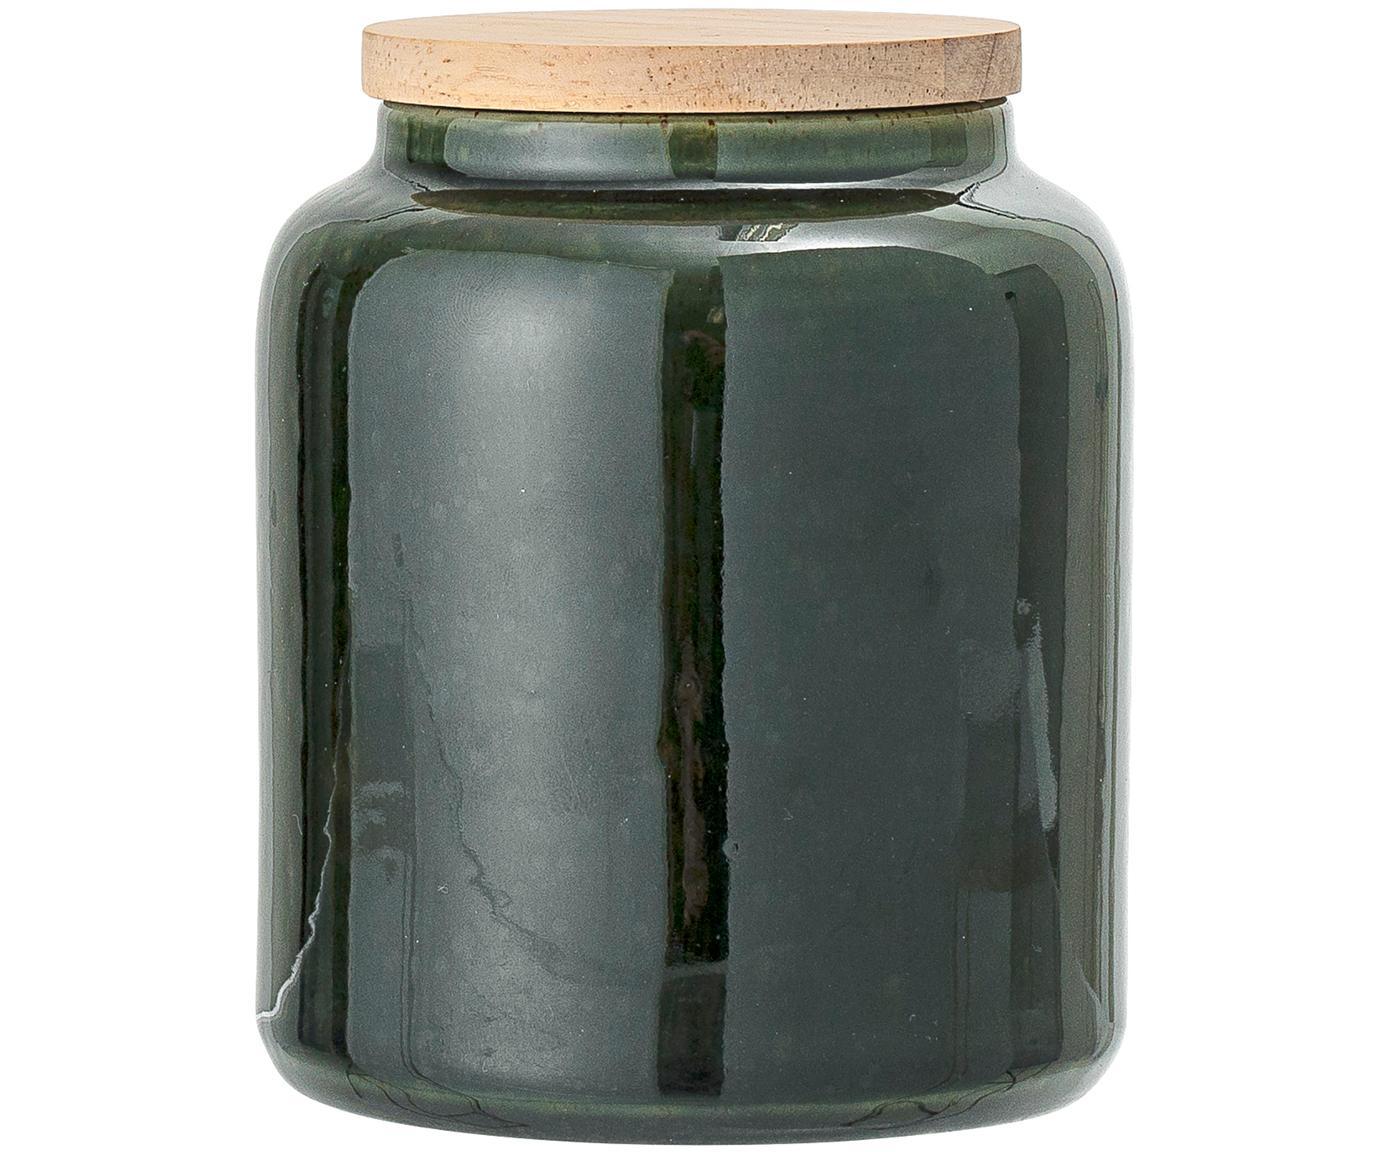 Handgemaakte opbergpot Joelle, Pot: keramiek, Deksel: acaciahout, siliconen, Donkergroen, Ø 10 x H 12 cm